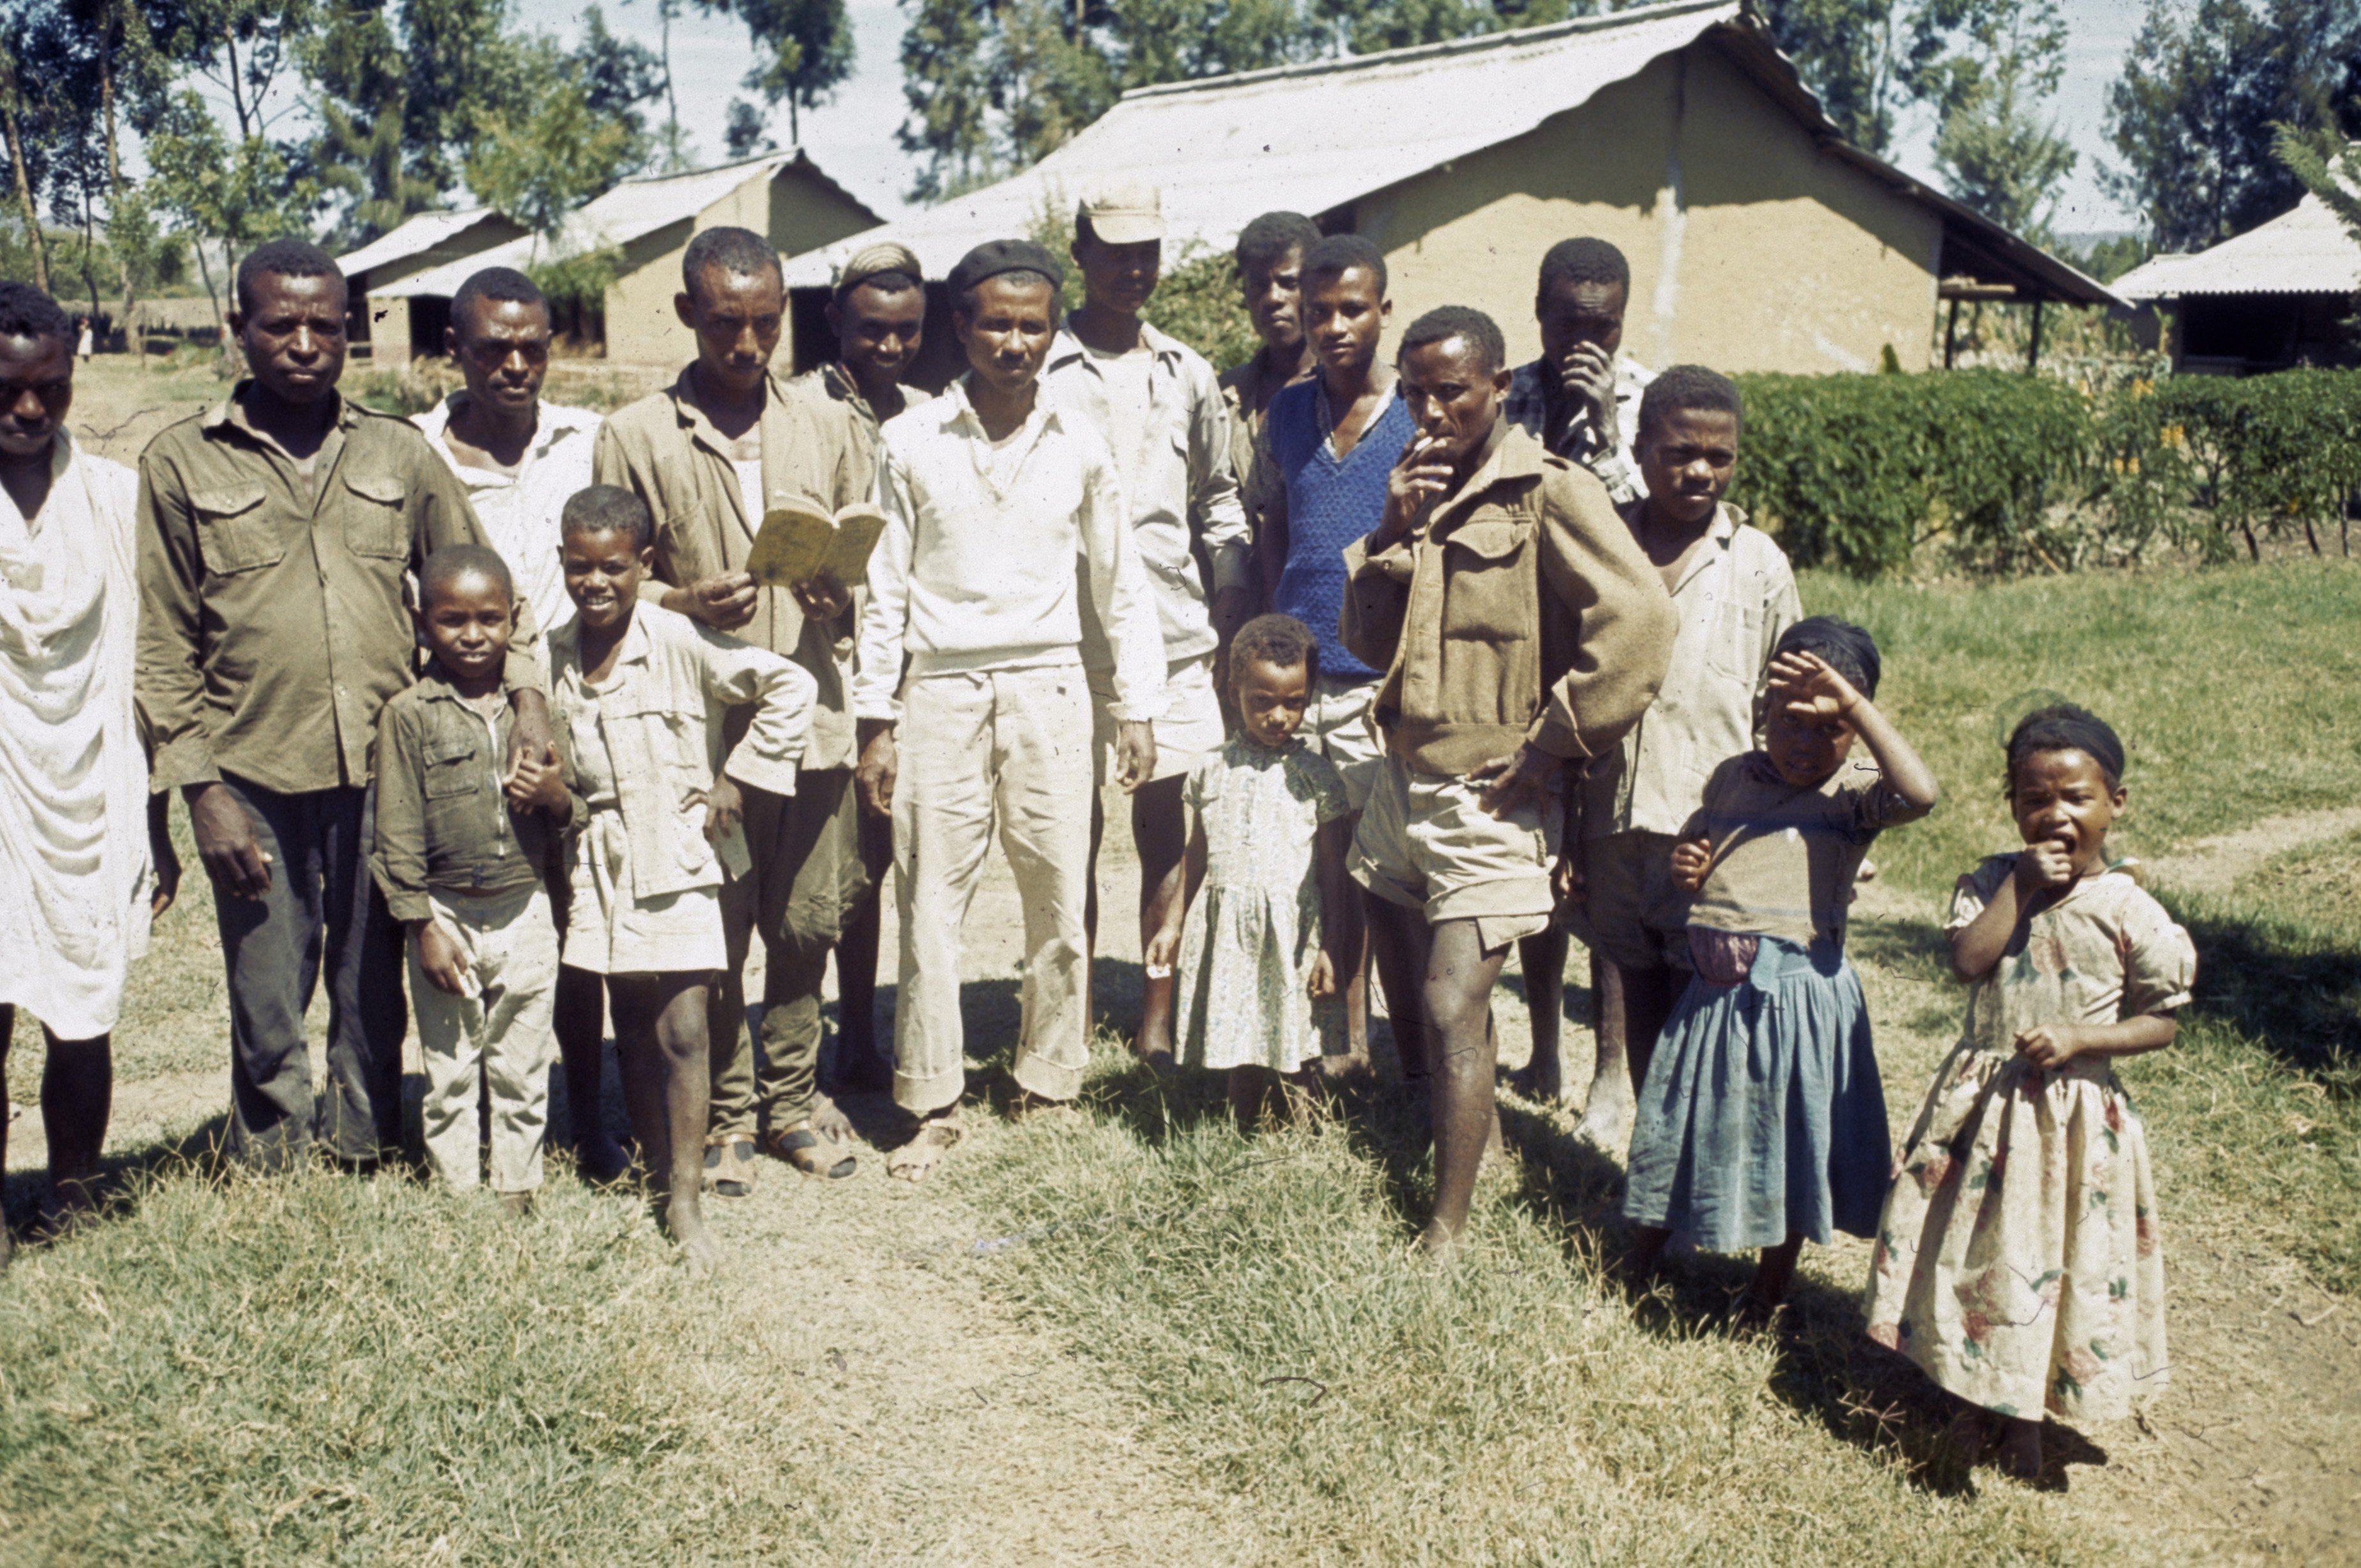 File Bezoek Koningin Juliana Pr Bernhard Pr Beatrix Pr Claus Aan Ethiopie Hva Bestanddeelnr 254 8321 Jpg Wikimedia Commons